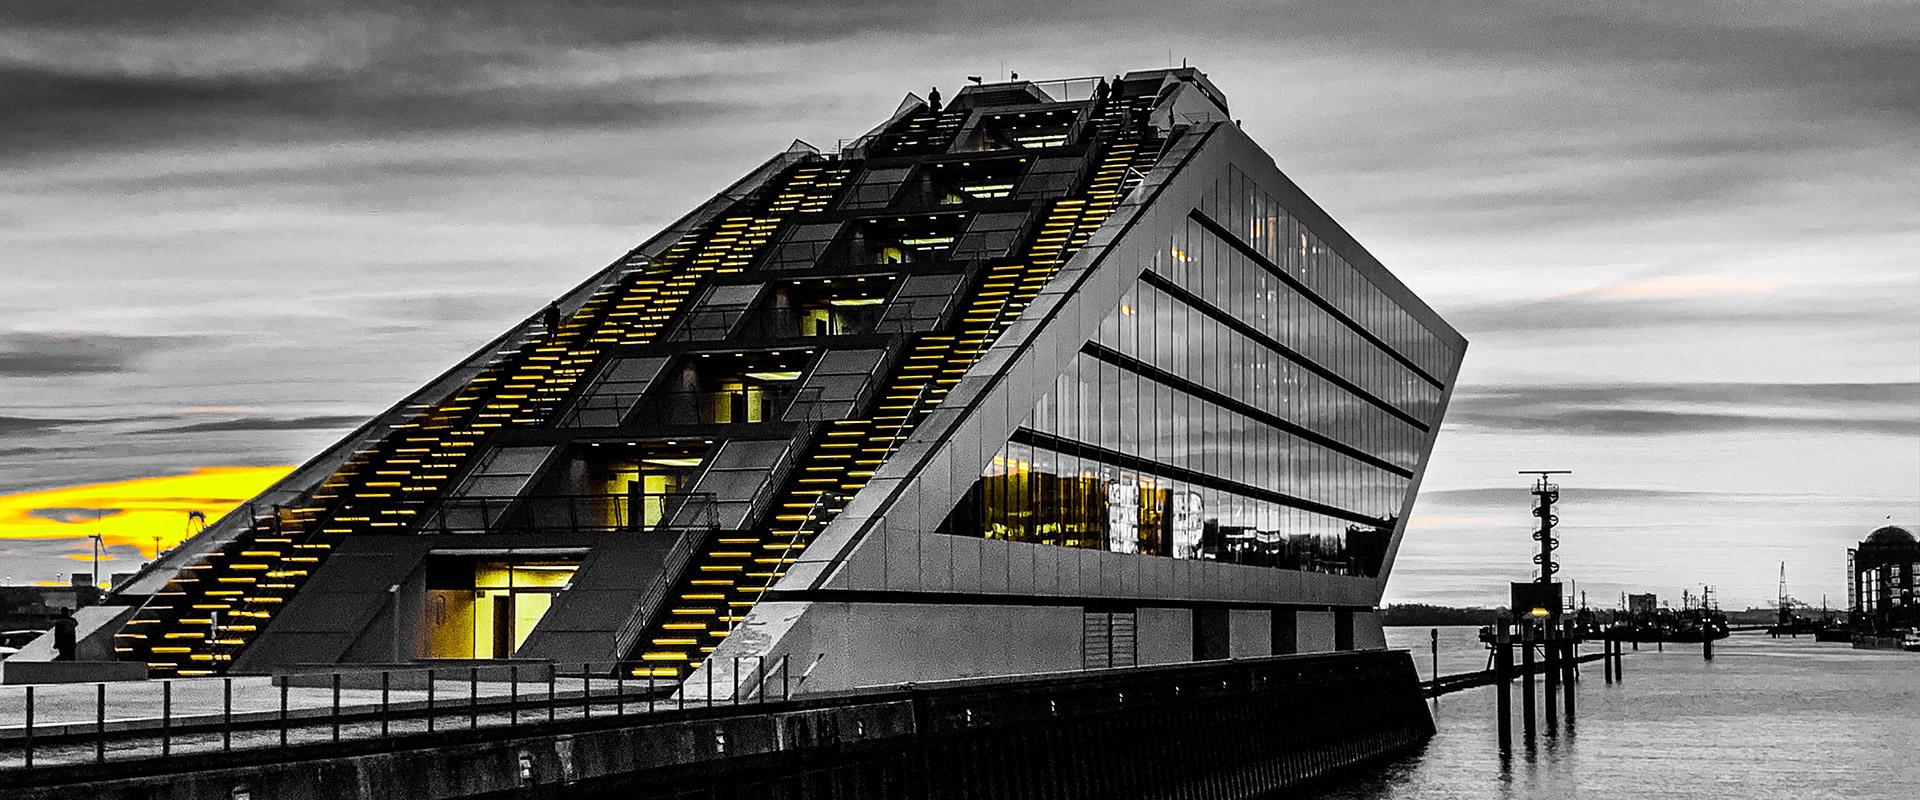 Hamburg Altona Dockland Gebäude